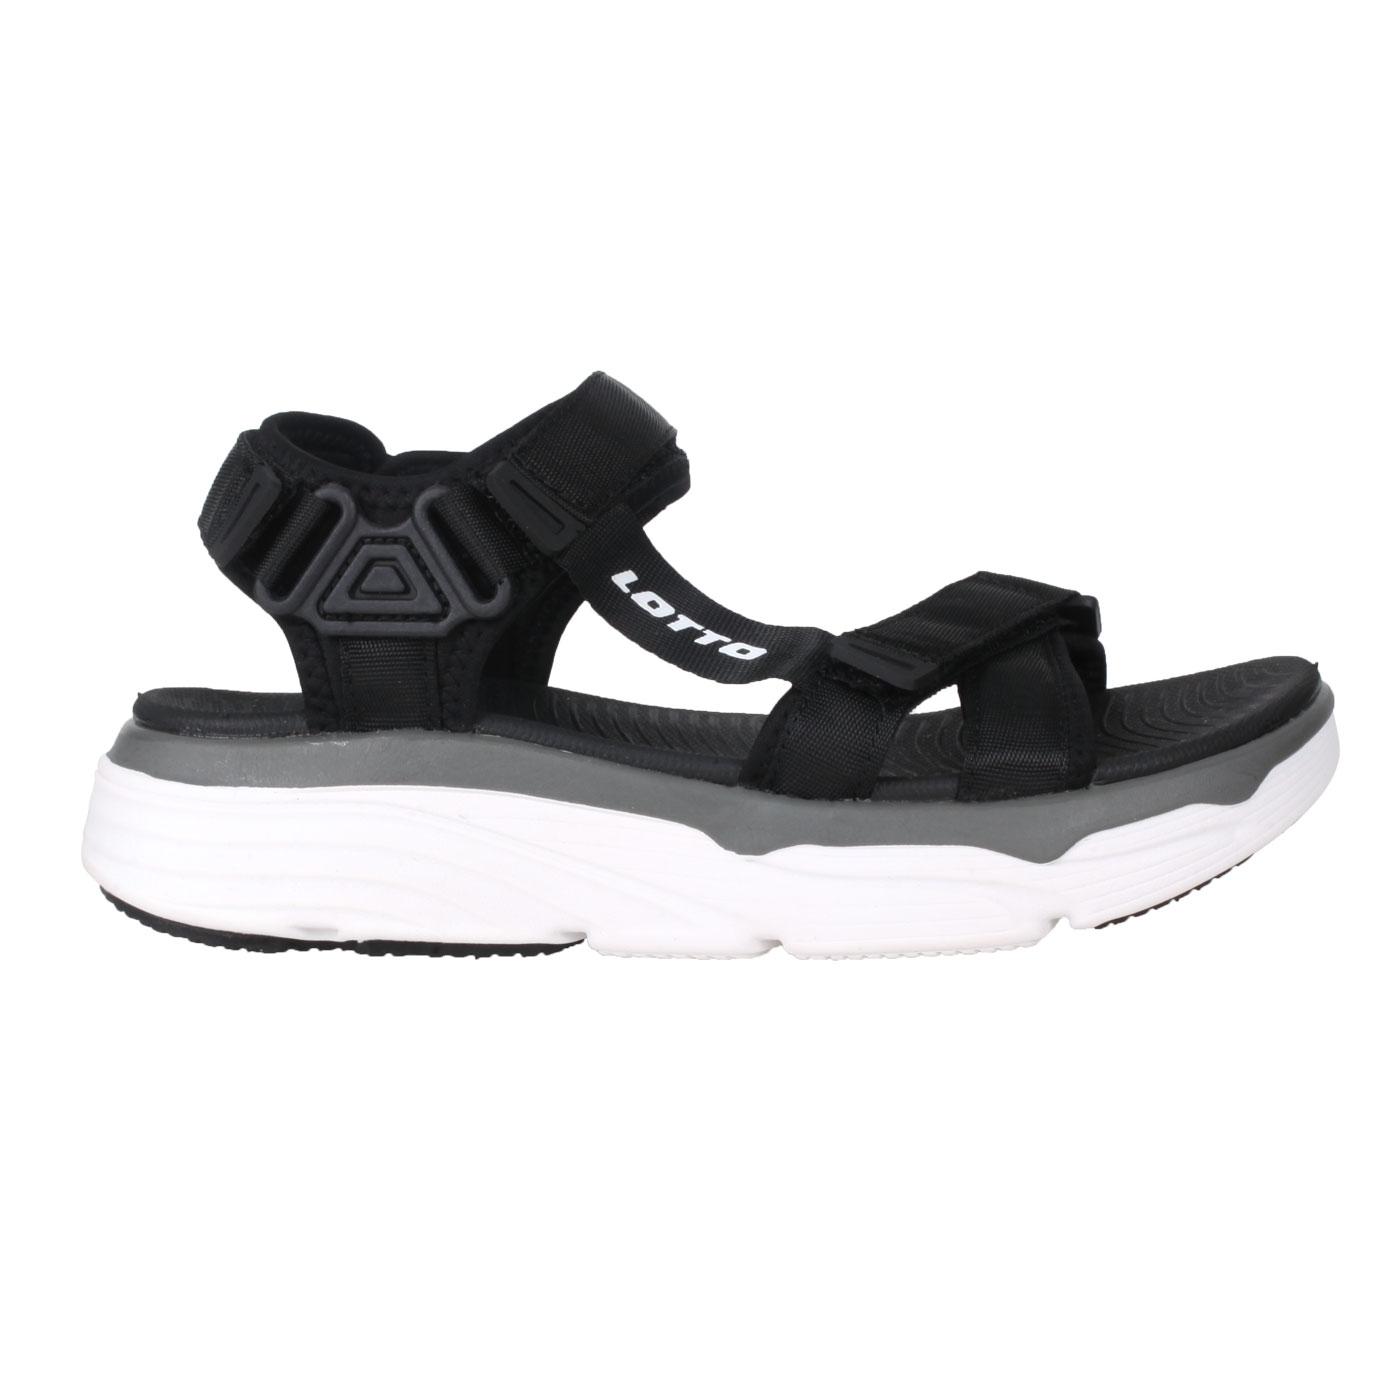 LOTTO 女款美型厚底涼鞋 LT1AWS3290 - 黑灰白